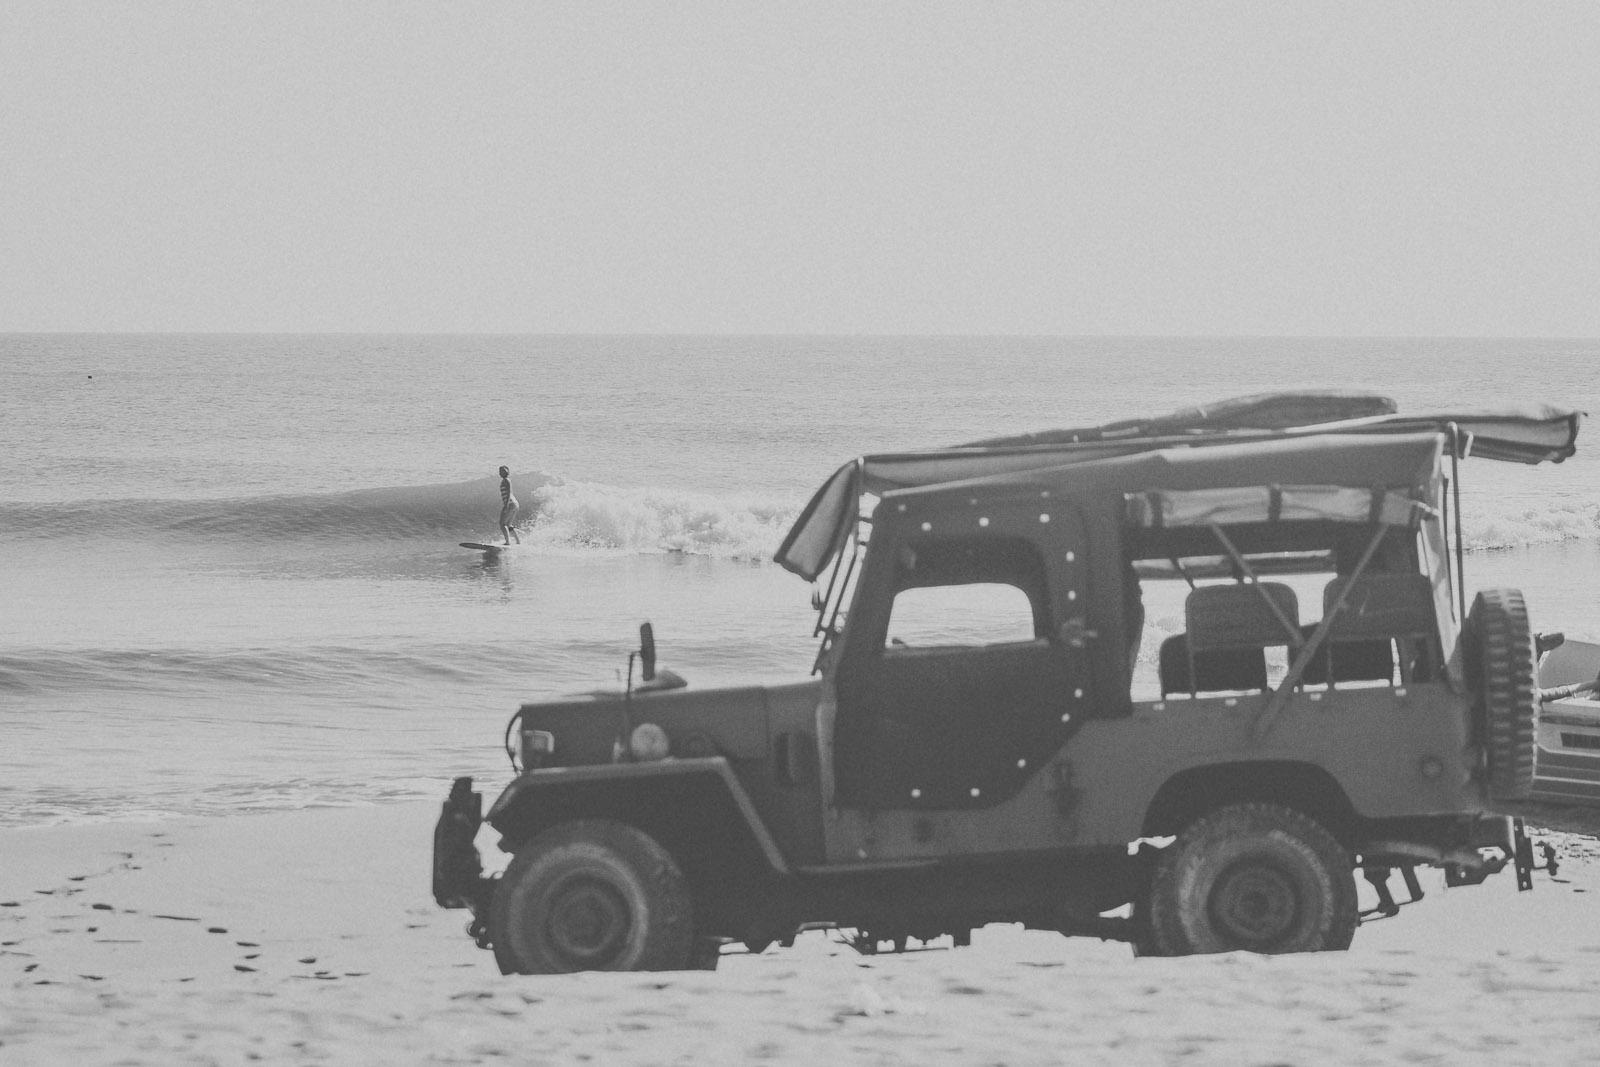 Sunshinestories-surf-travel-blog-IMG_9356